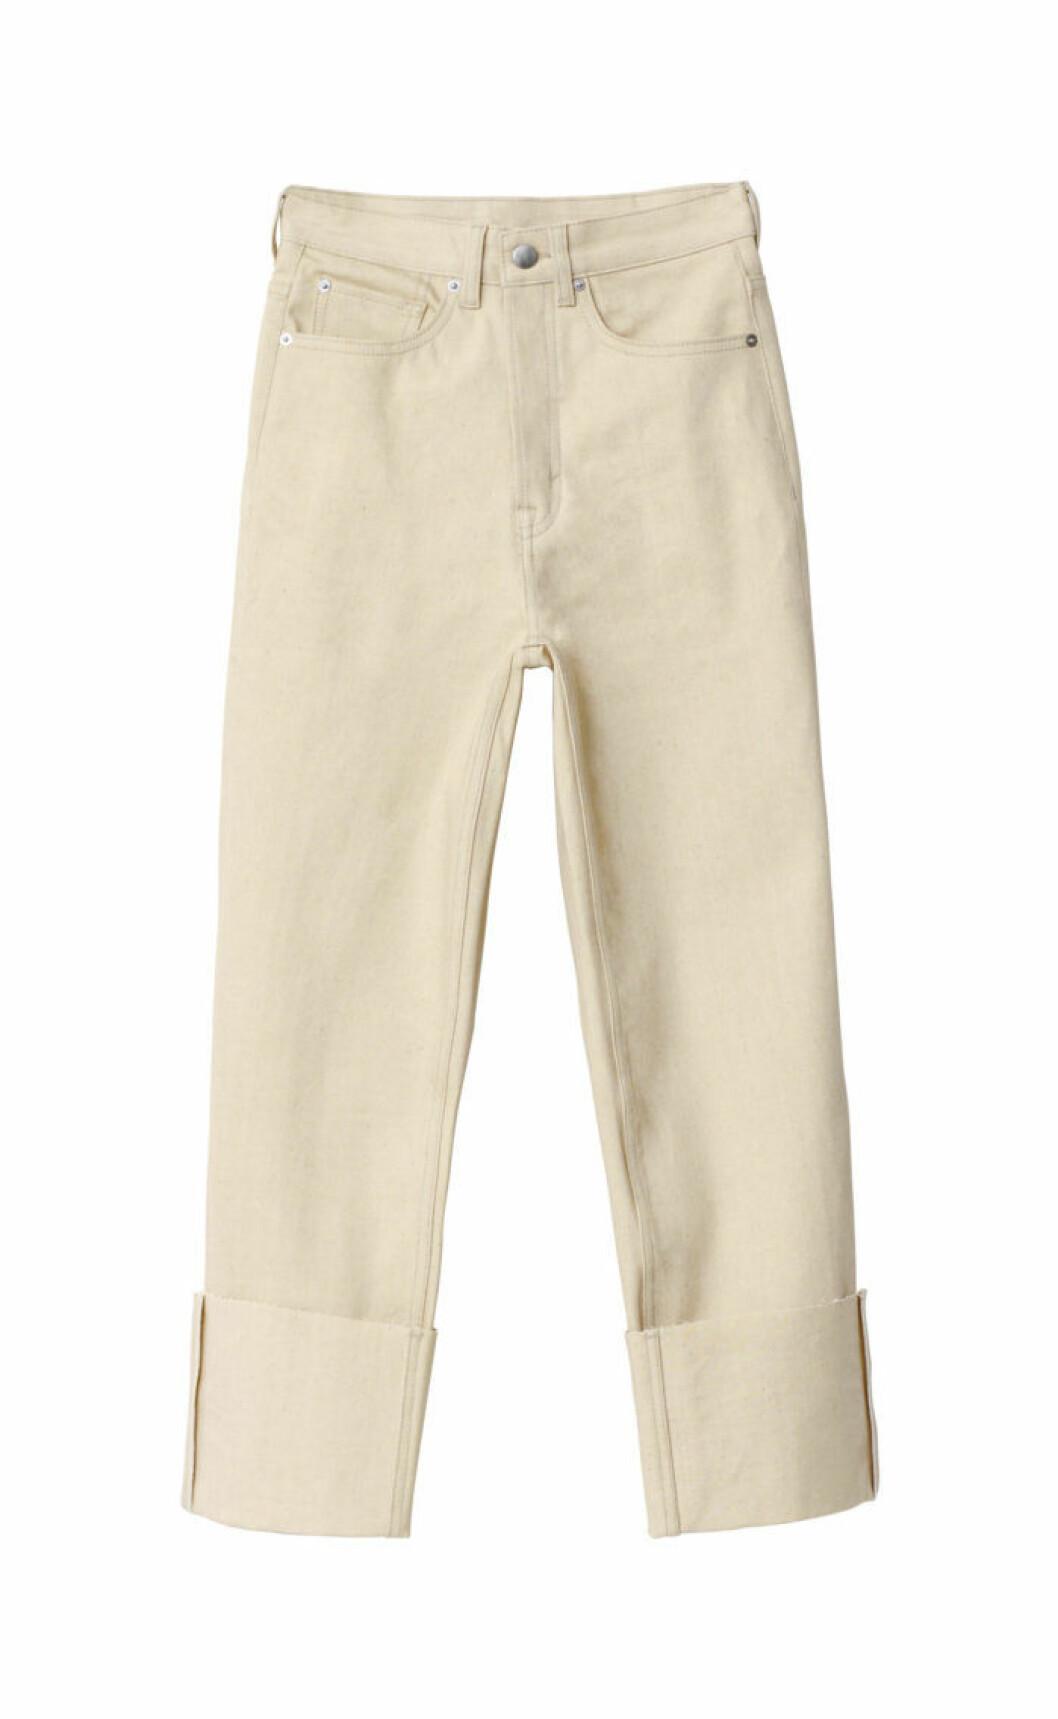 Vita jeans H&M Studio aw18